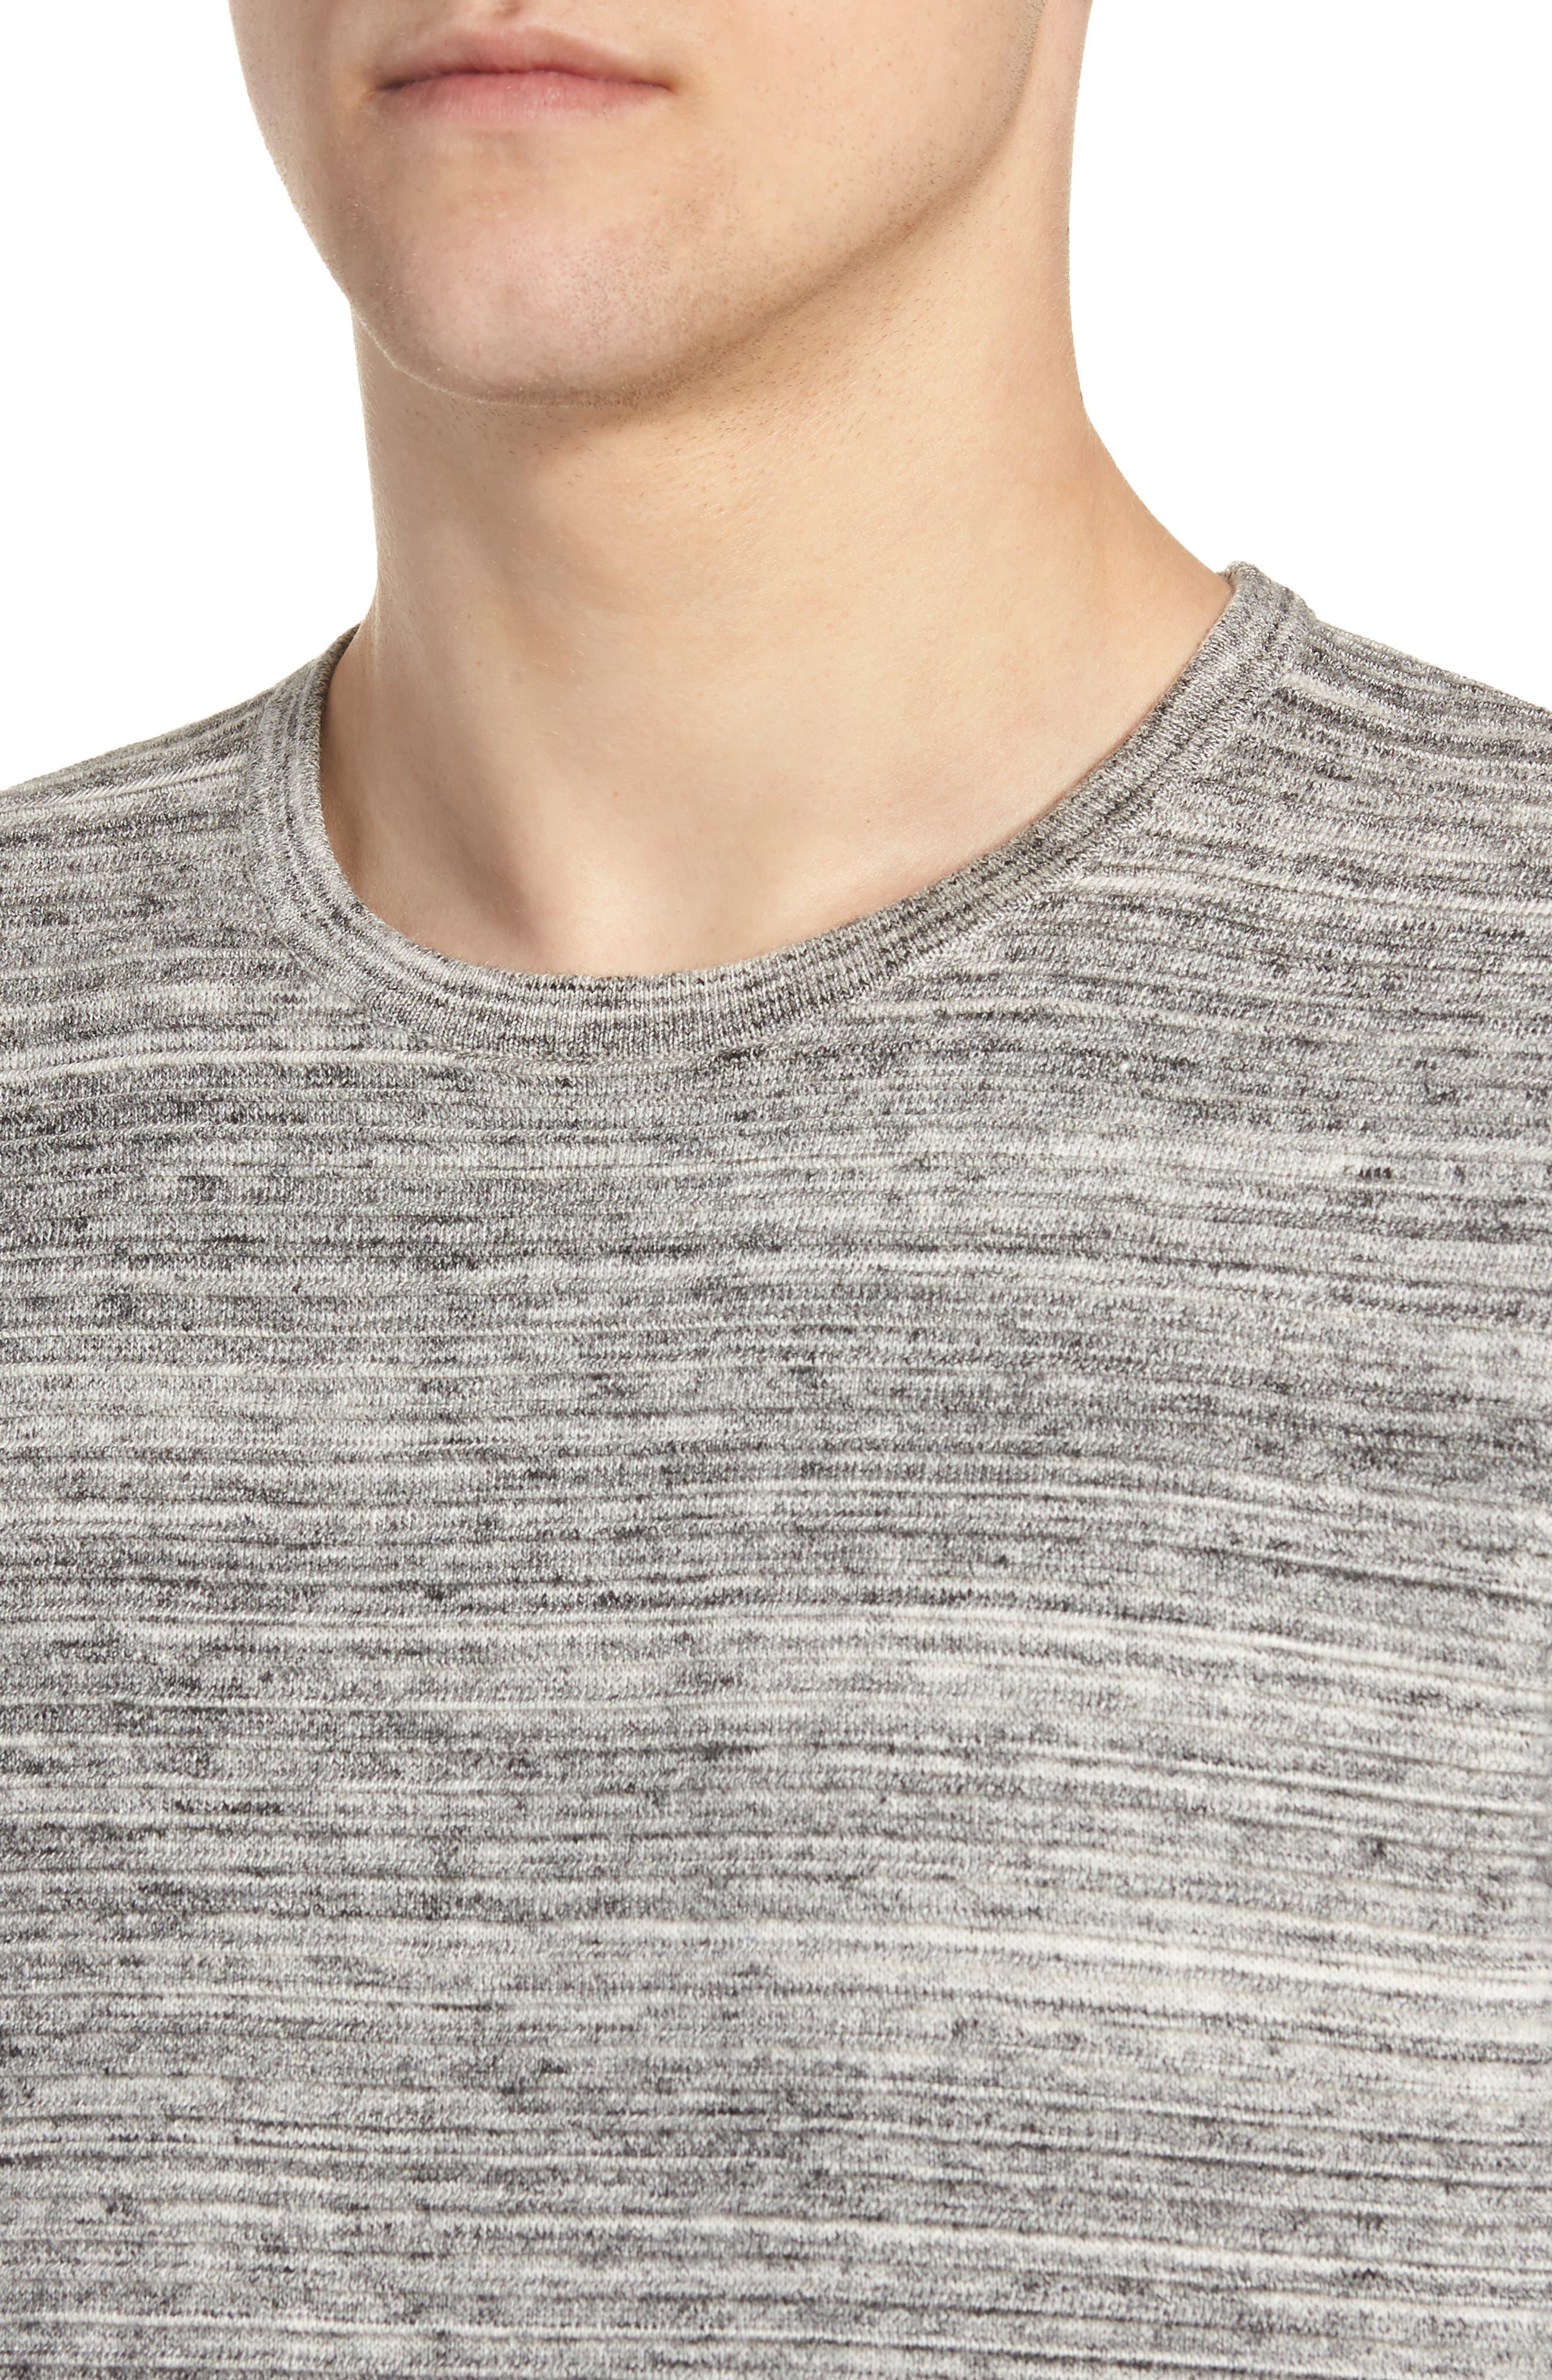 Ottoman Crewneck Sweater,                             Alternate thumbnail 4, color,                             GREY TORNADO SPACEDYE